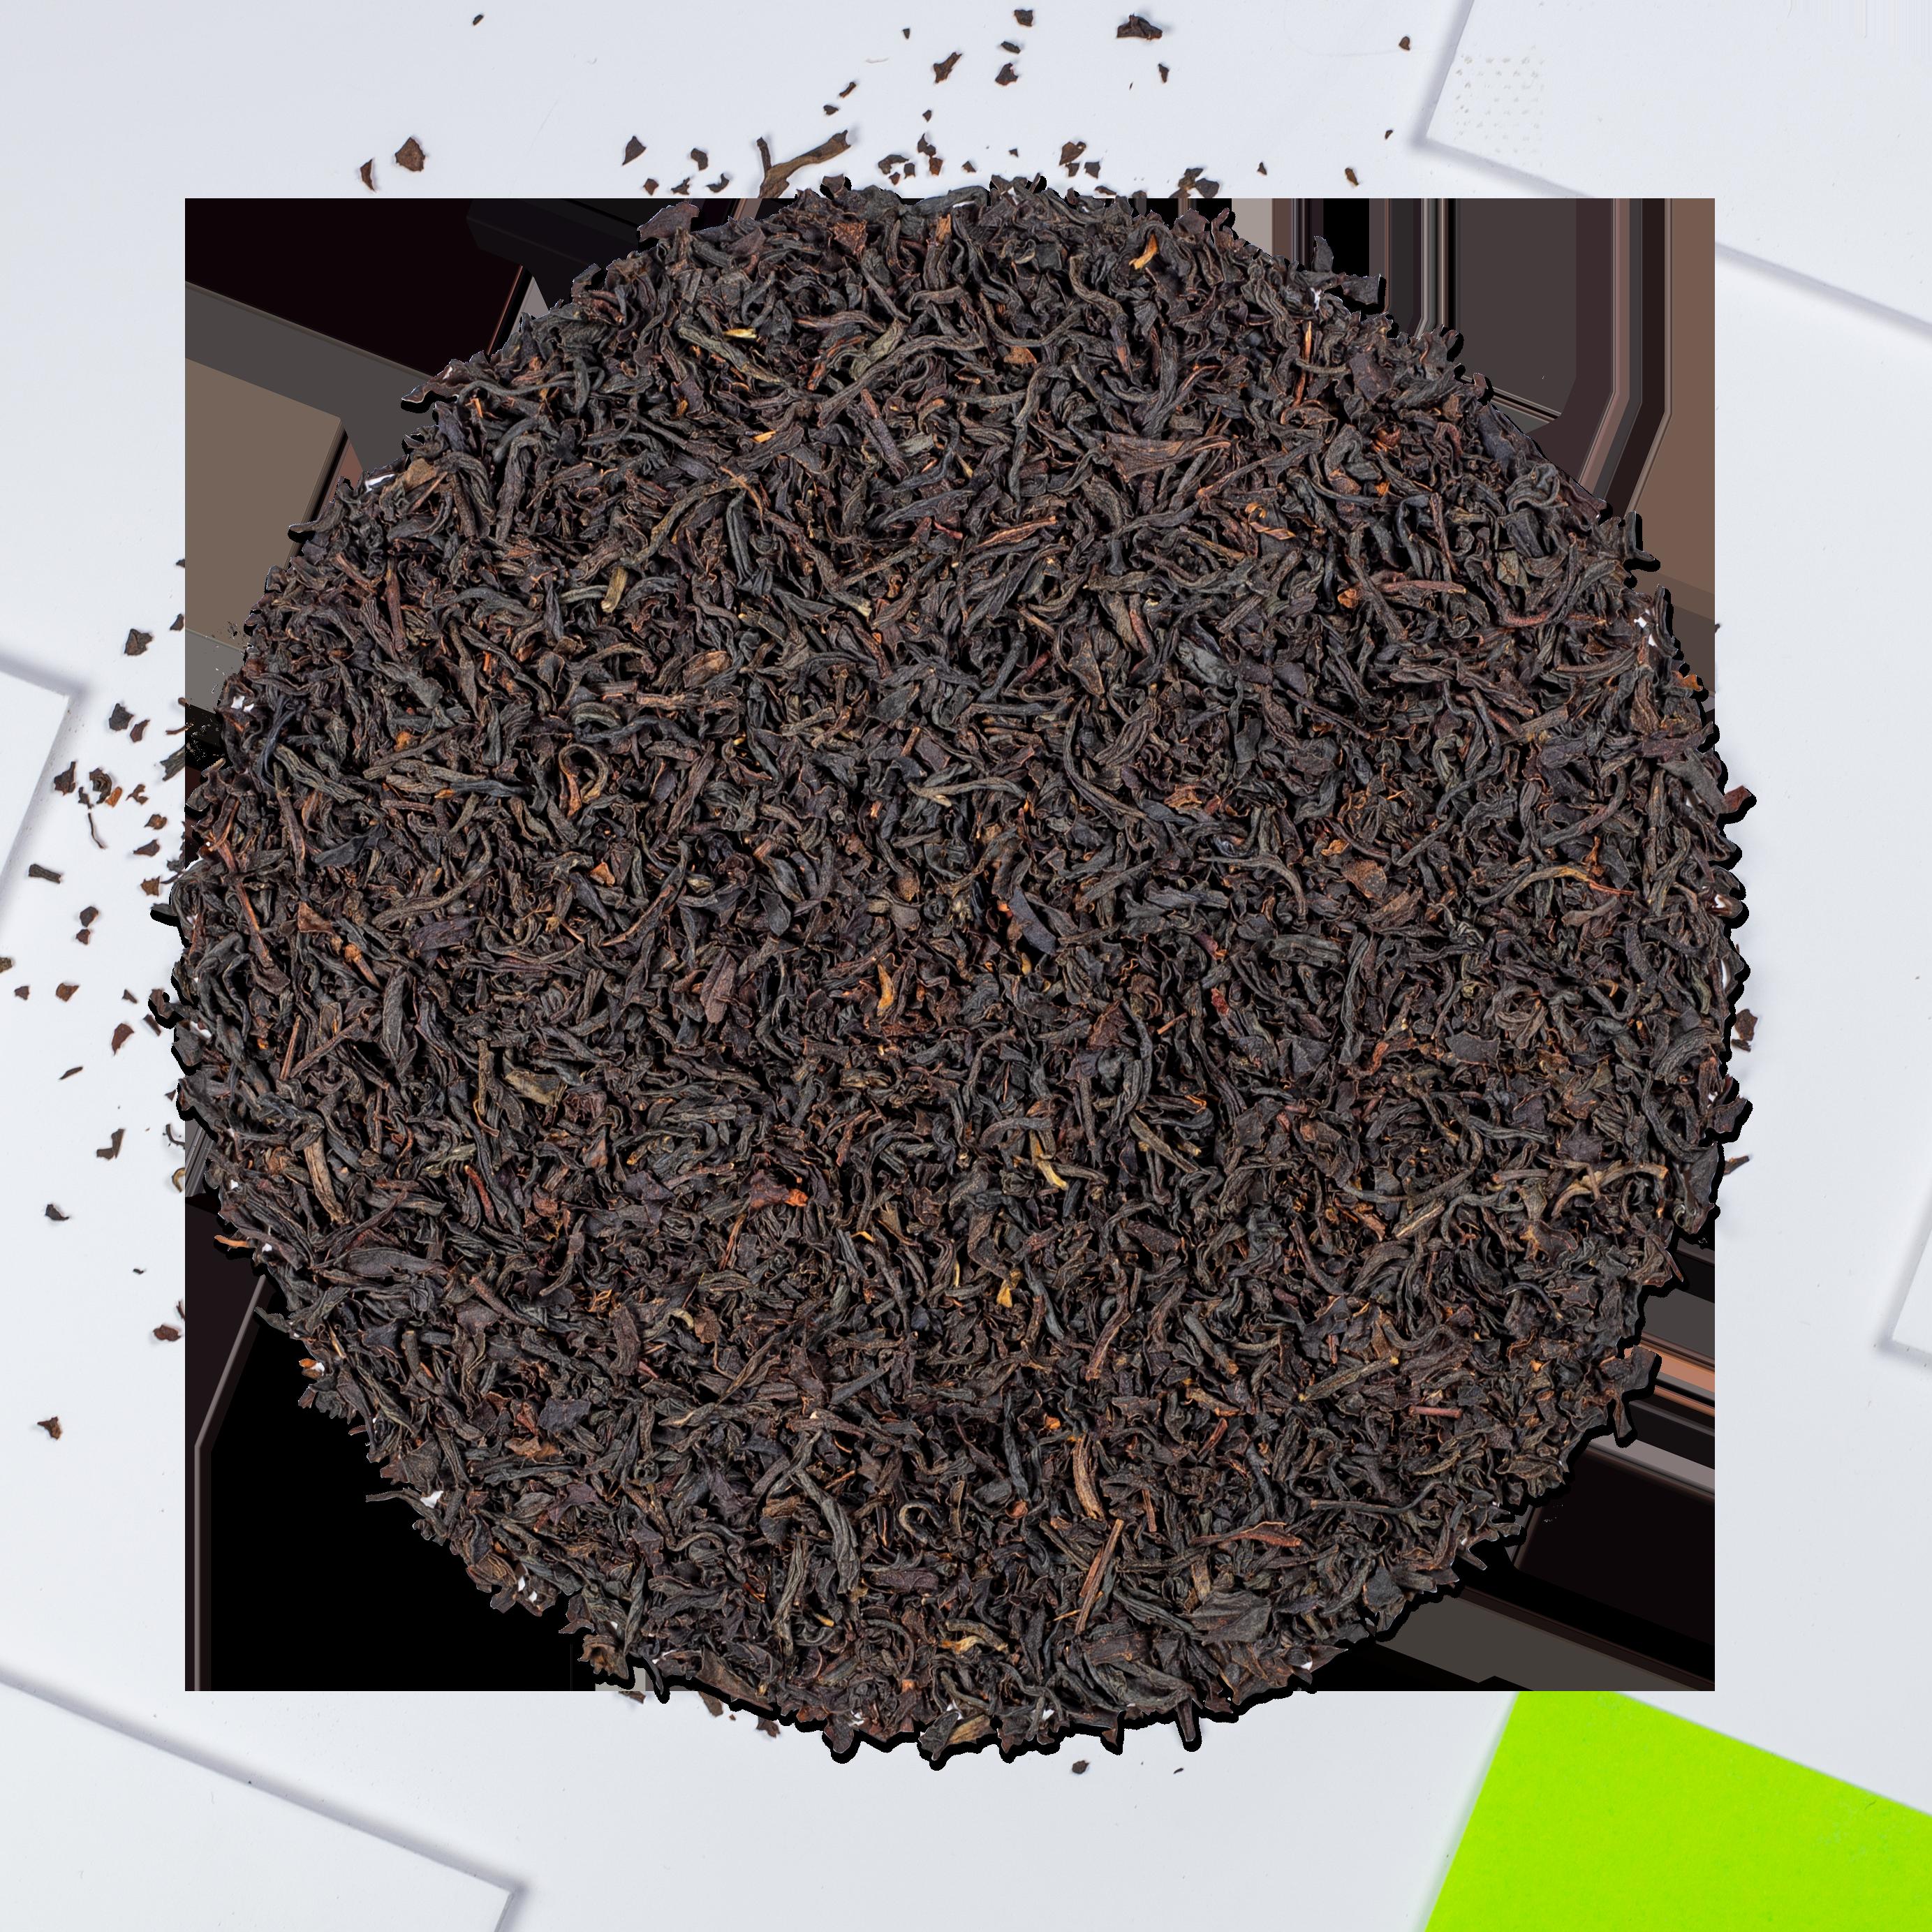 Thé noir - Earl Grey déthéiné aux agrumes - Kusmi Tea